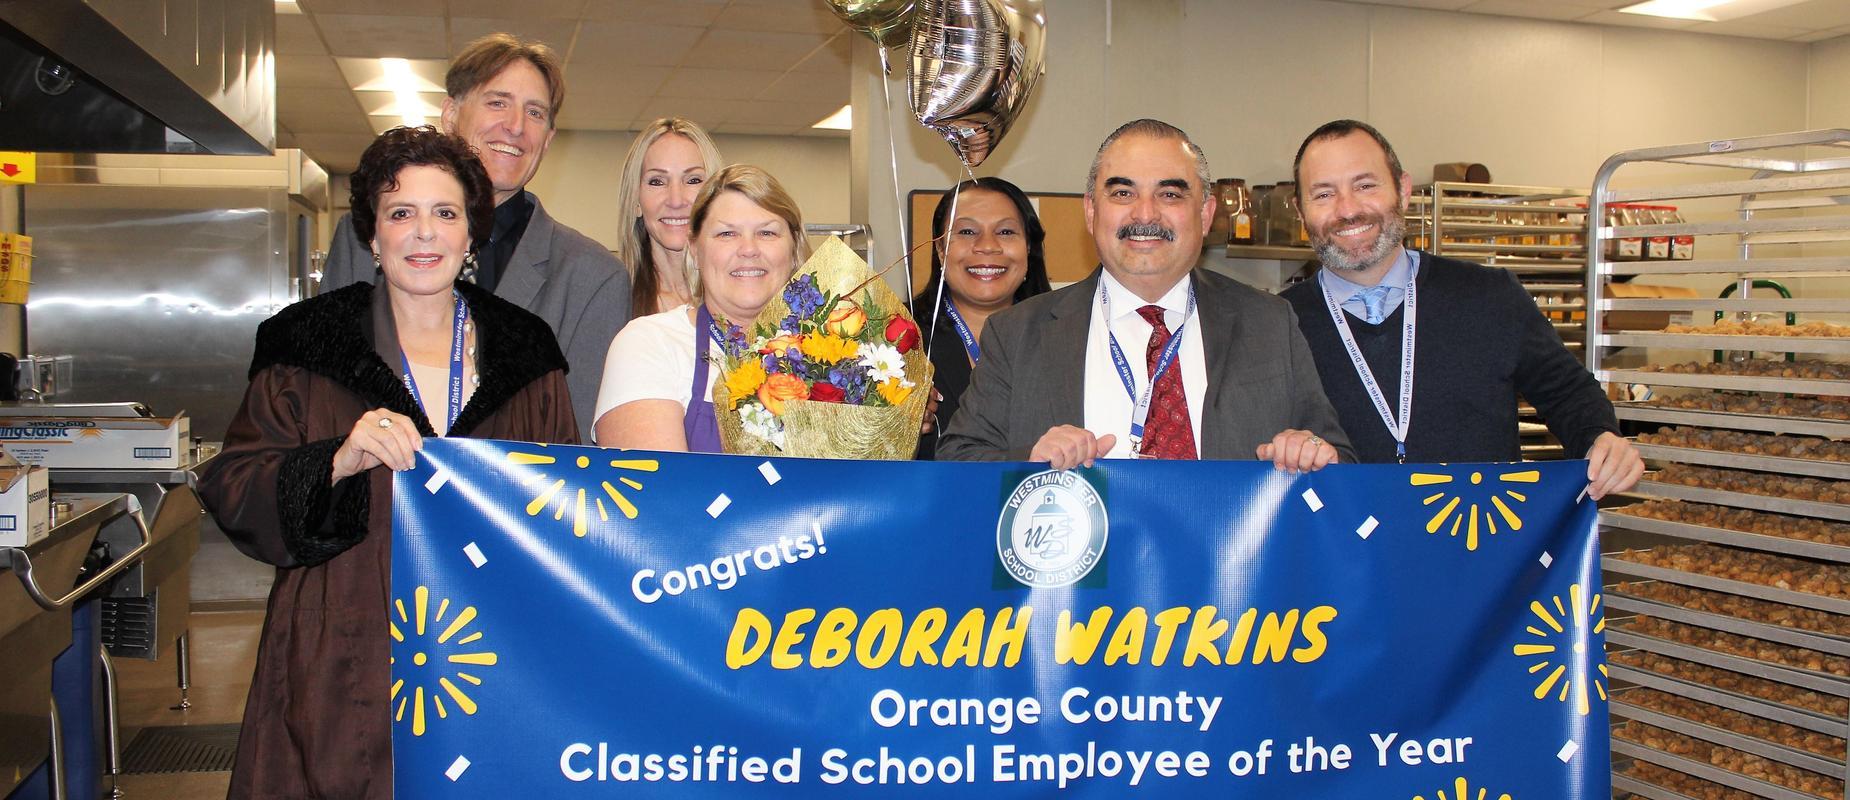 Orange County Classified School Employee of the Year